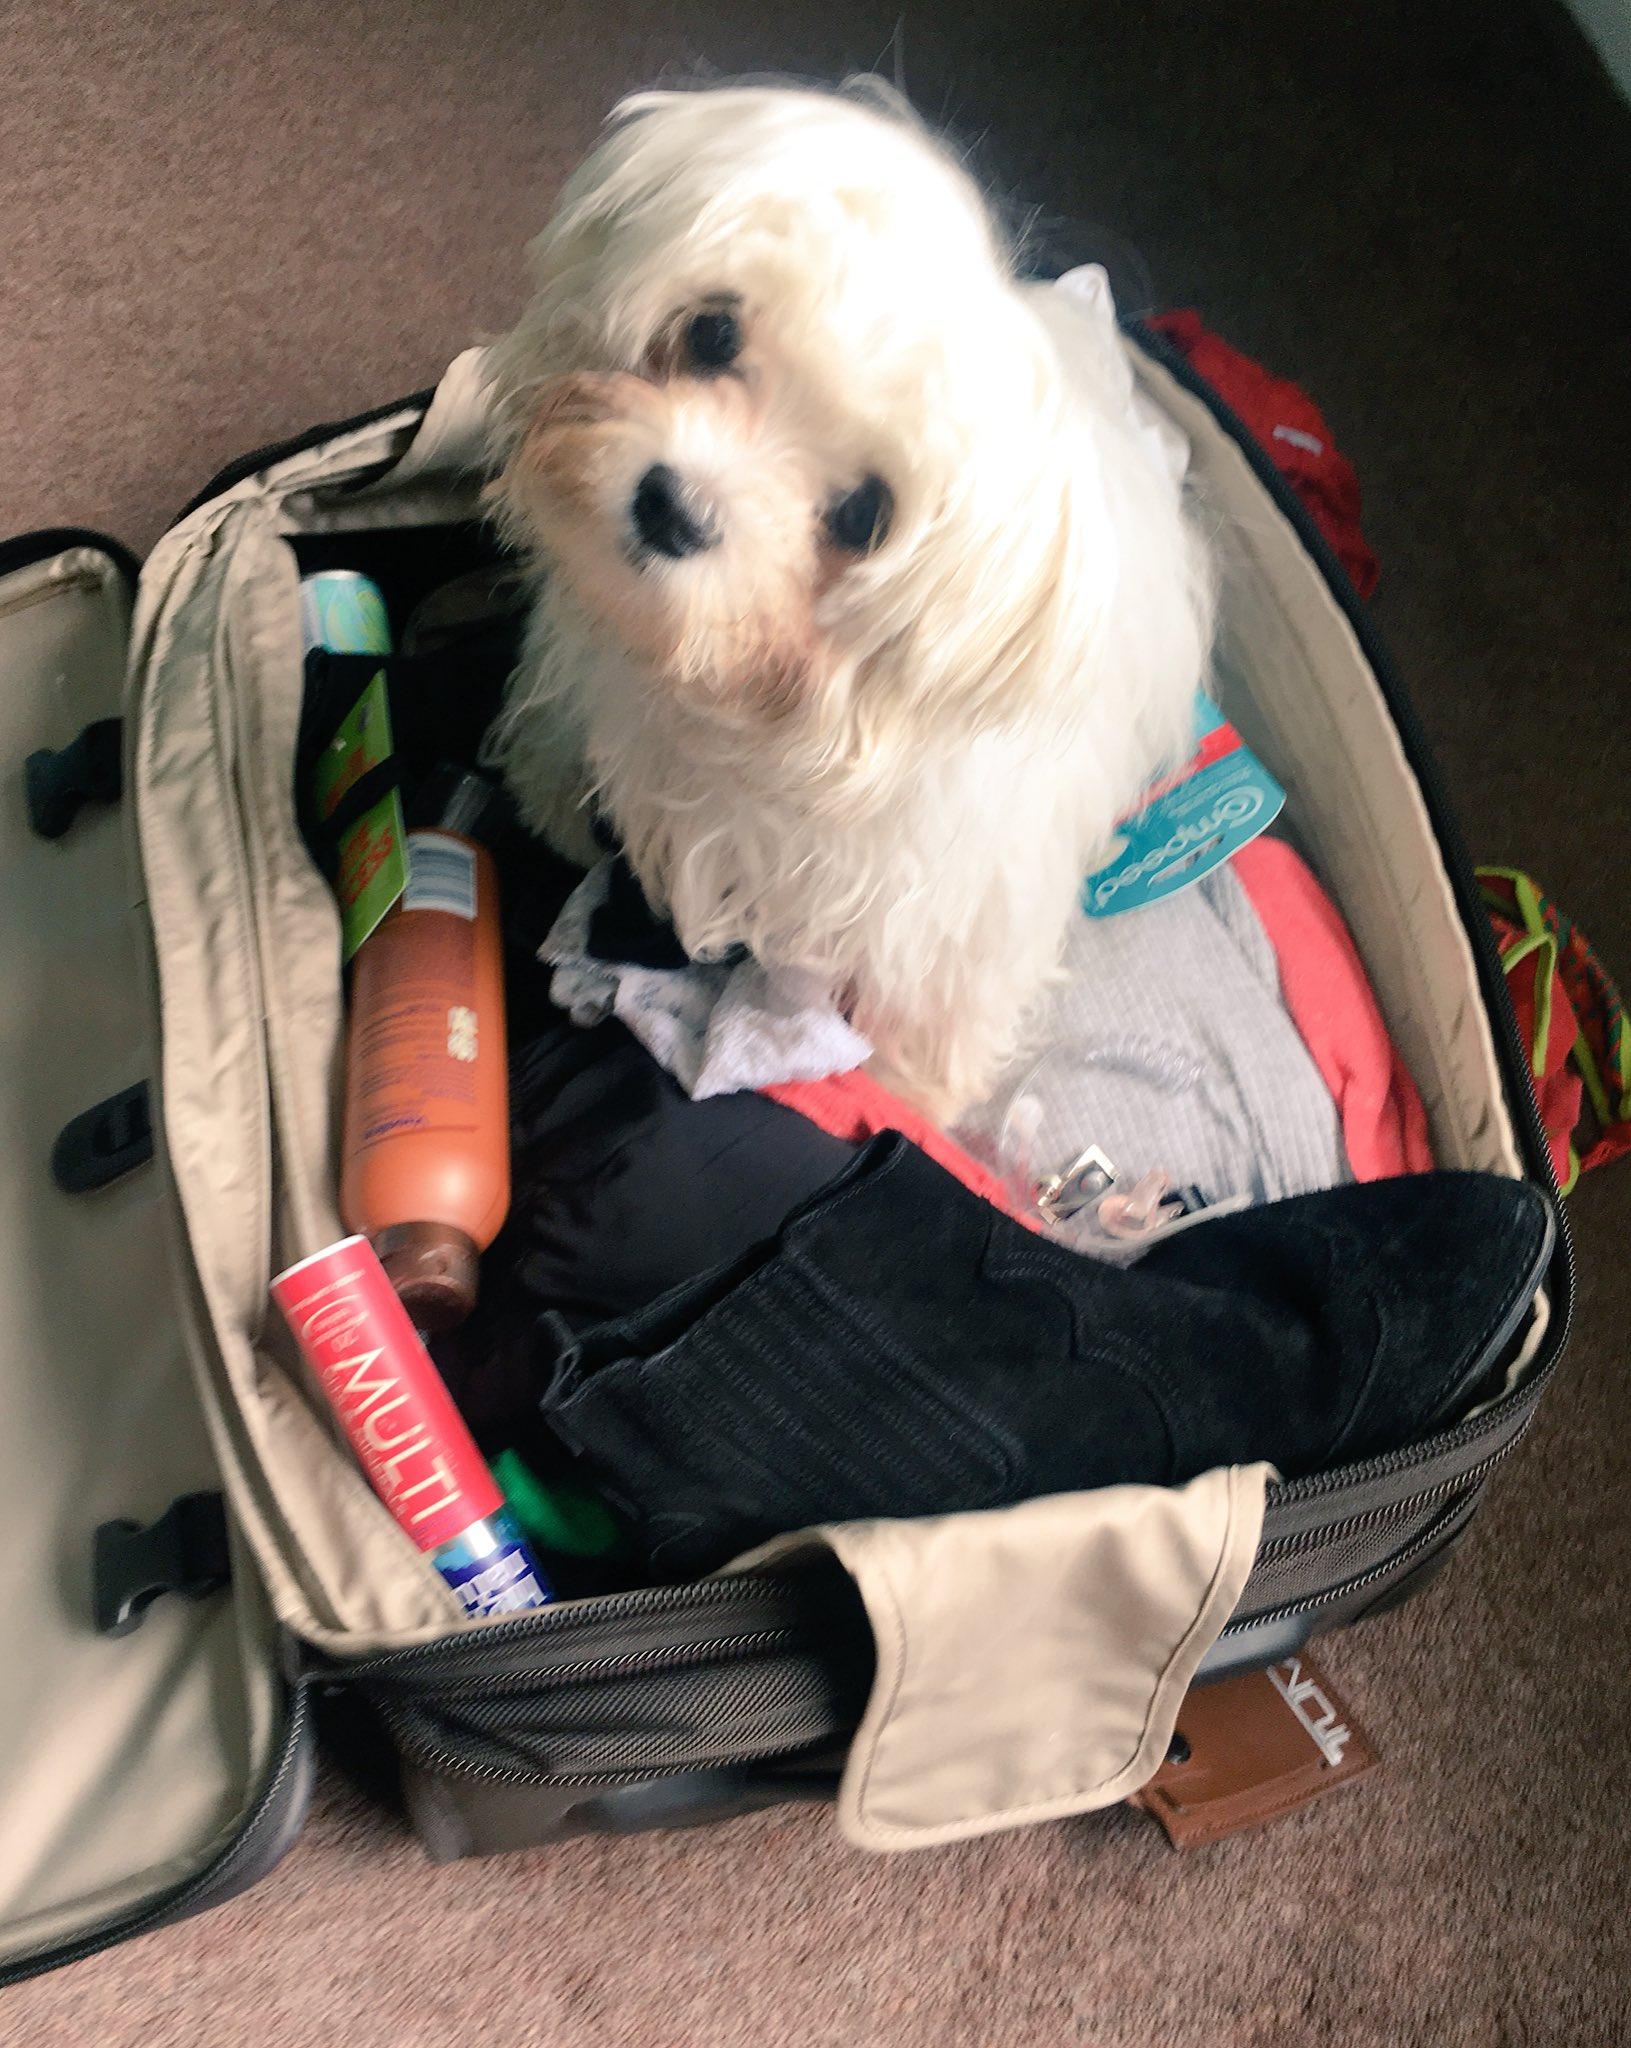 I'll help you unpack mum 😍 https://t.co/W9iJh7asF5